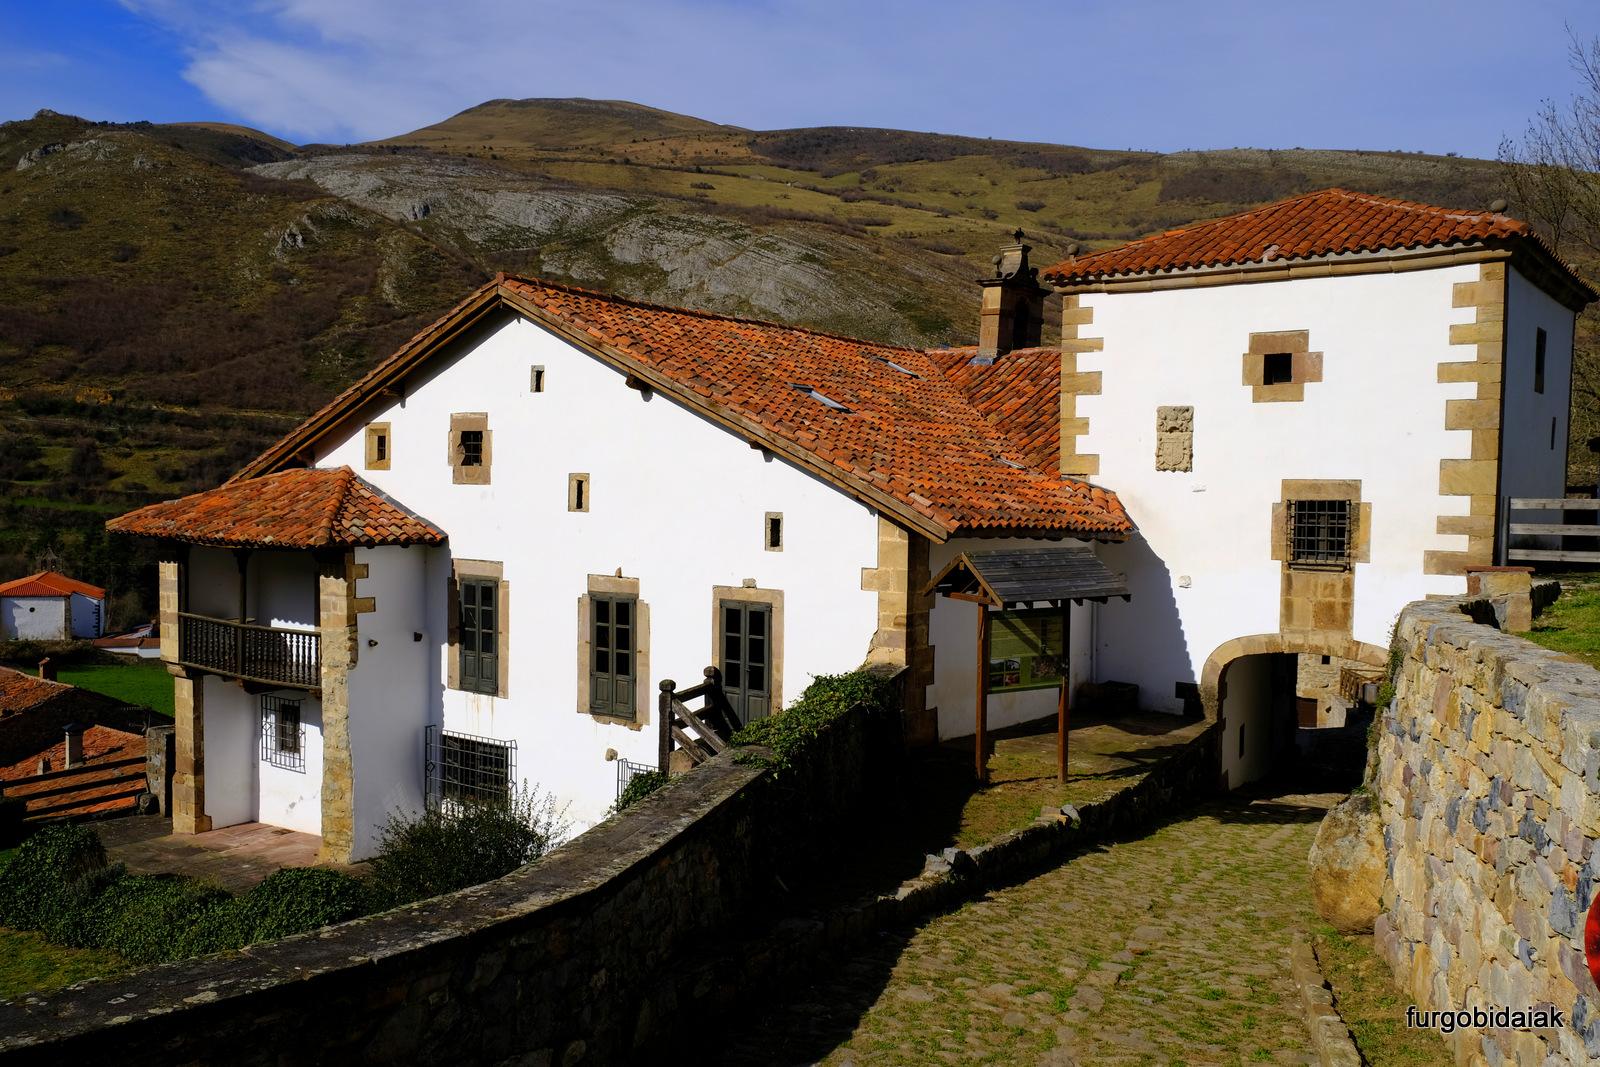 La Casona, Tudanca, Cantabria